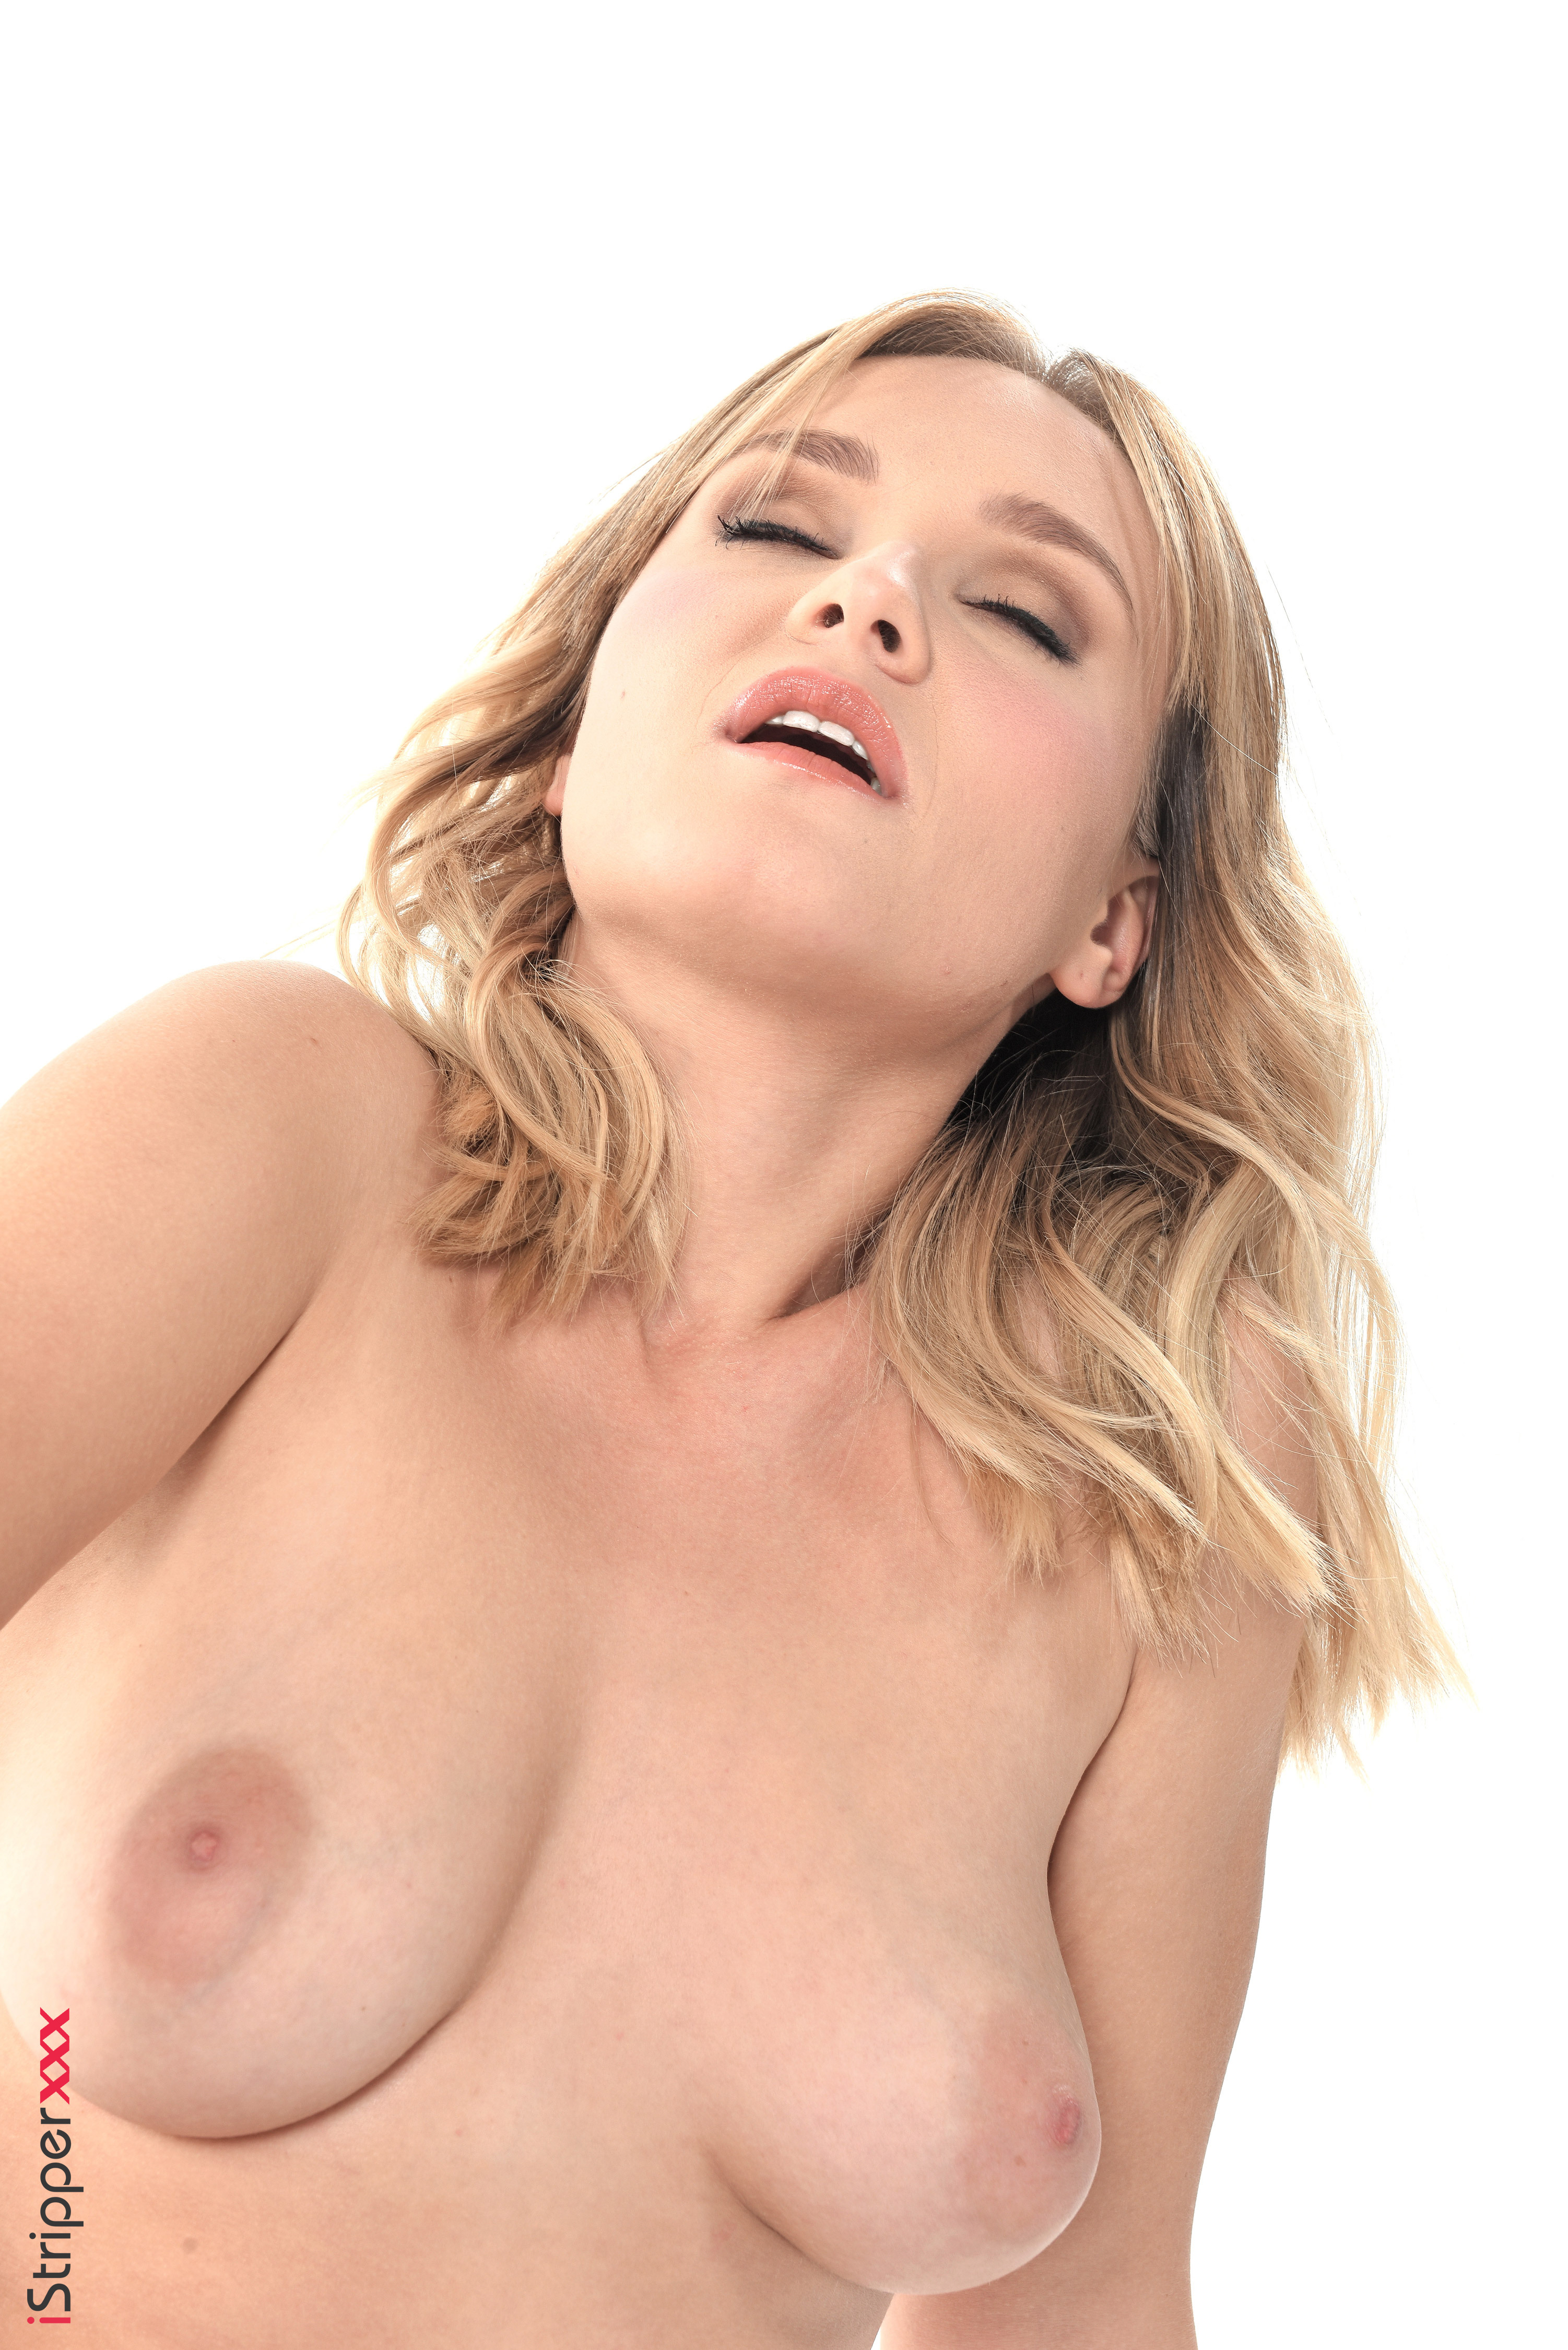 shaved vagina photo